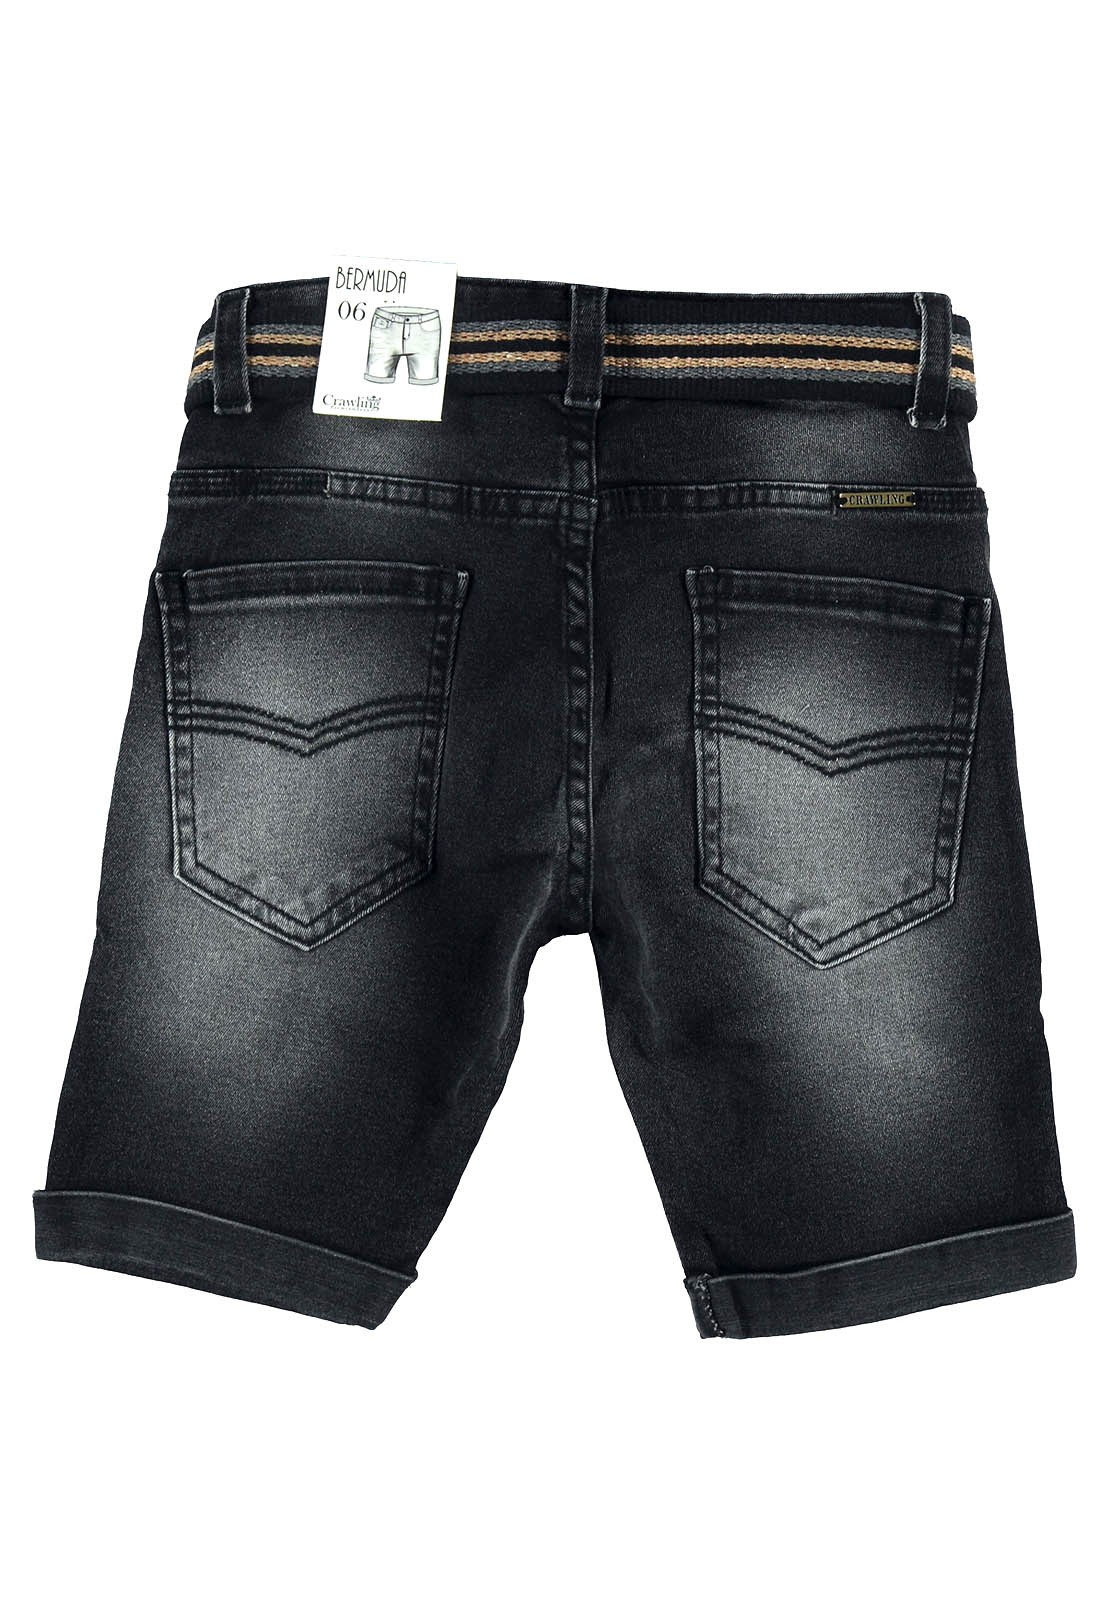 Bermuda Masculina Crawling Jeans C/Cinto